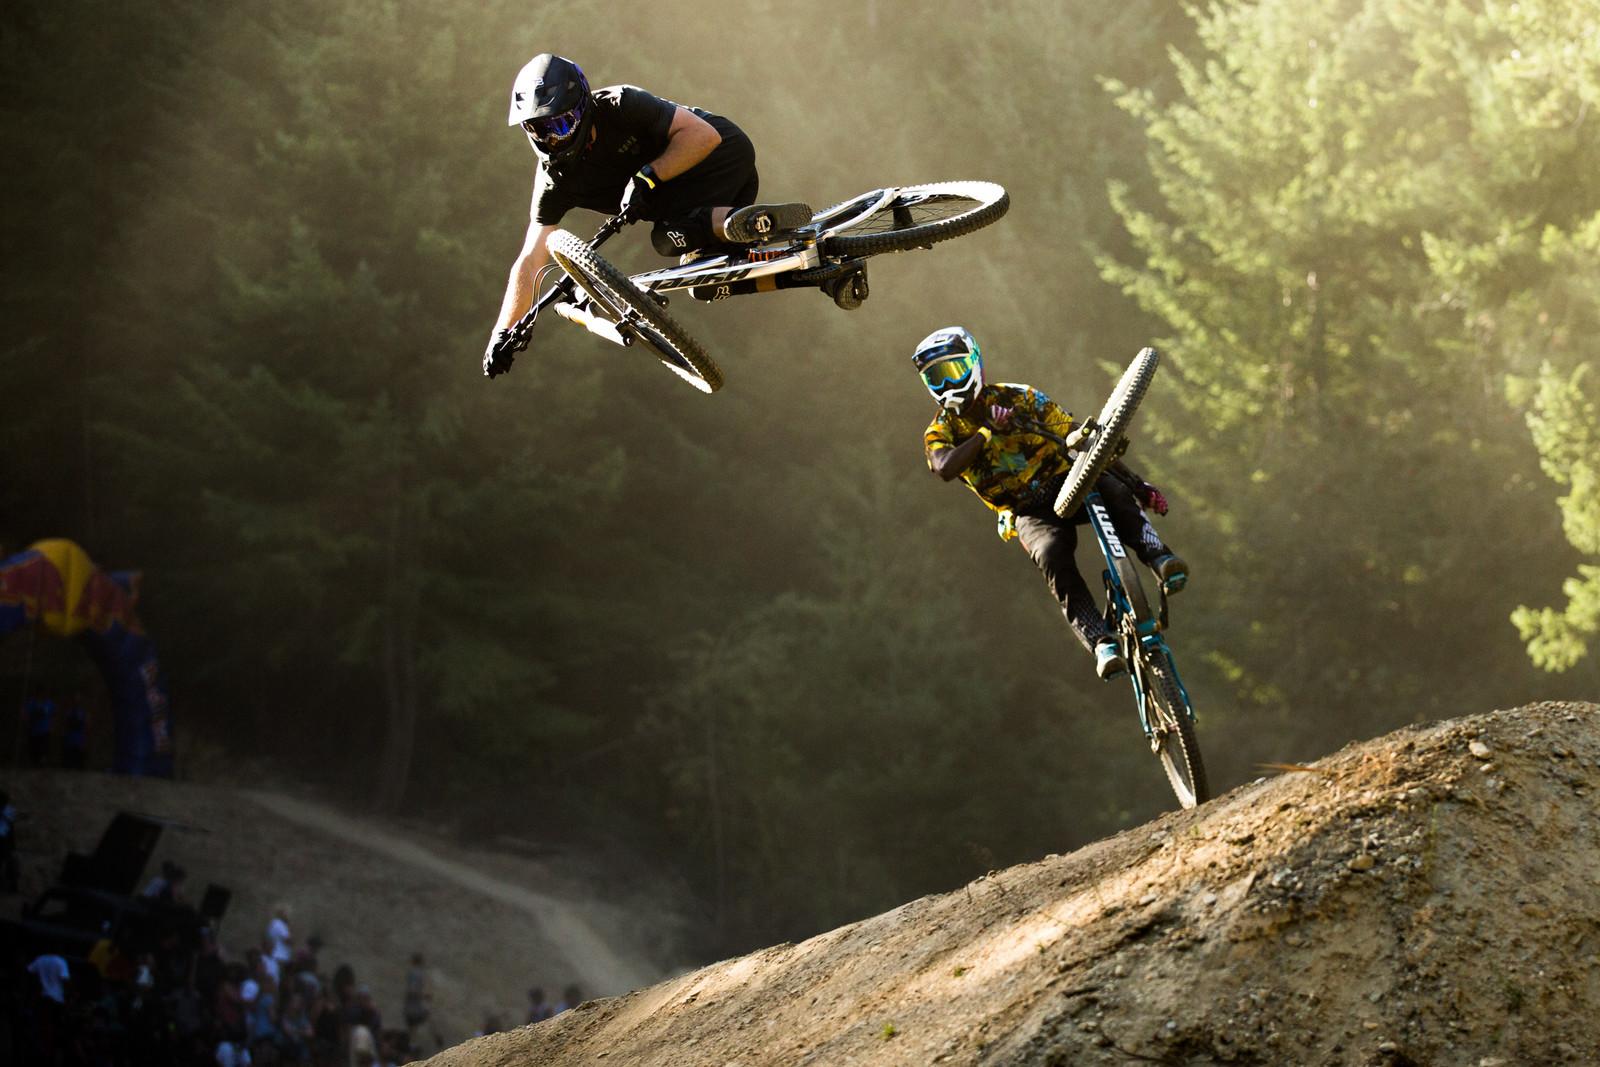 Bas and Eliot - McGazza Fest Dream Track Jam - Mountain Biking Pictures - Vital MTB